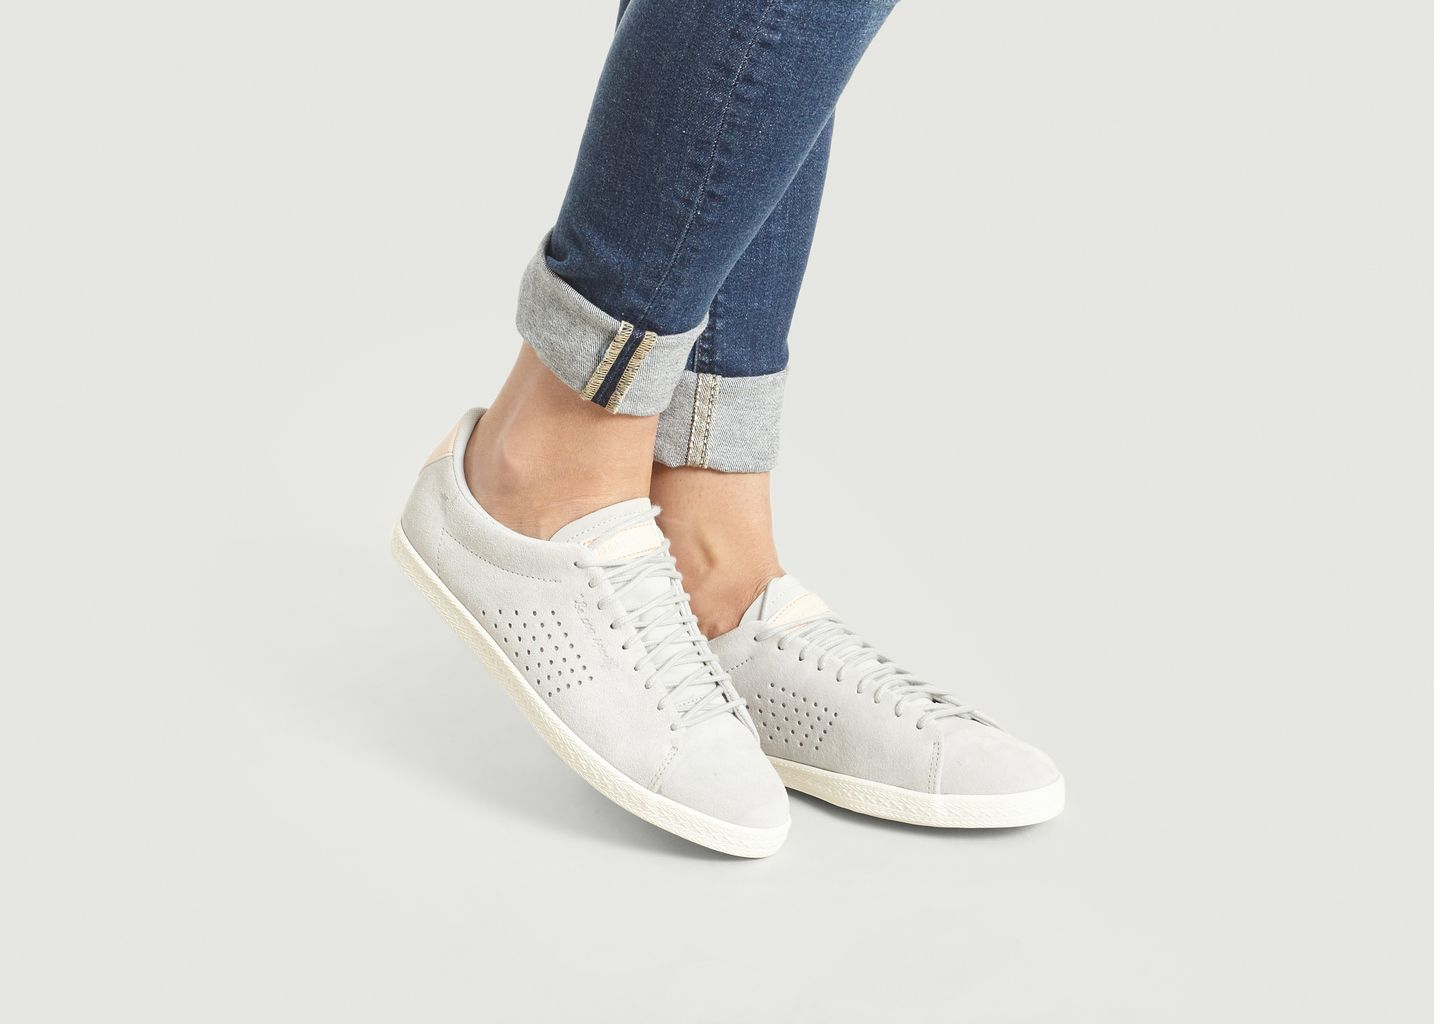 9ea25a6c4837 Suede Charline Sneakers Light Grey Le Coq Sportif | L'Exception